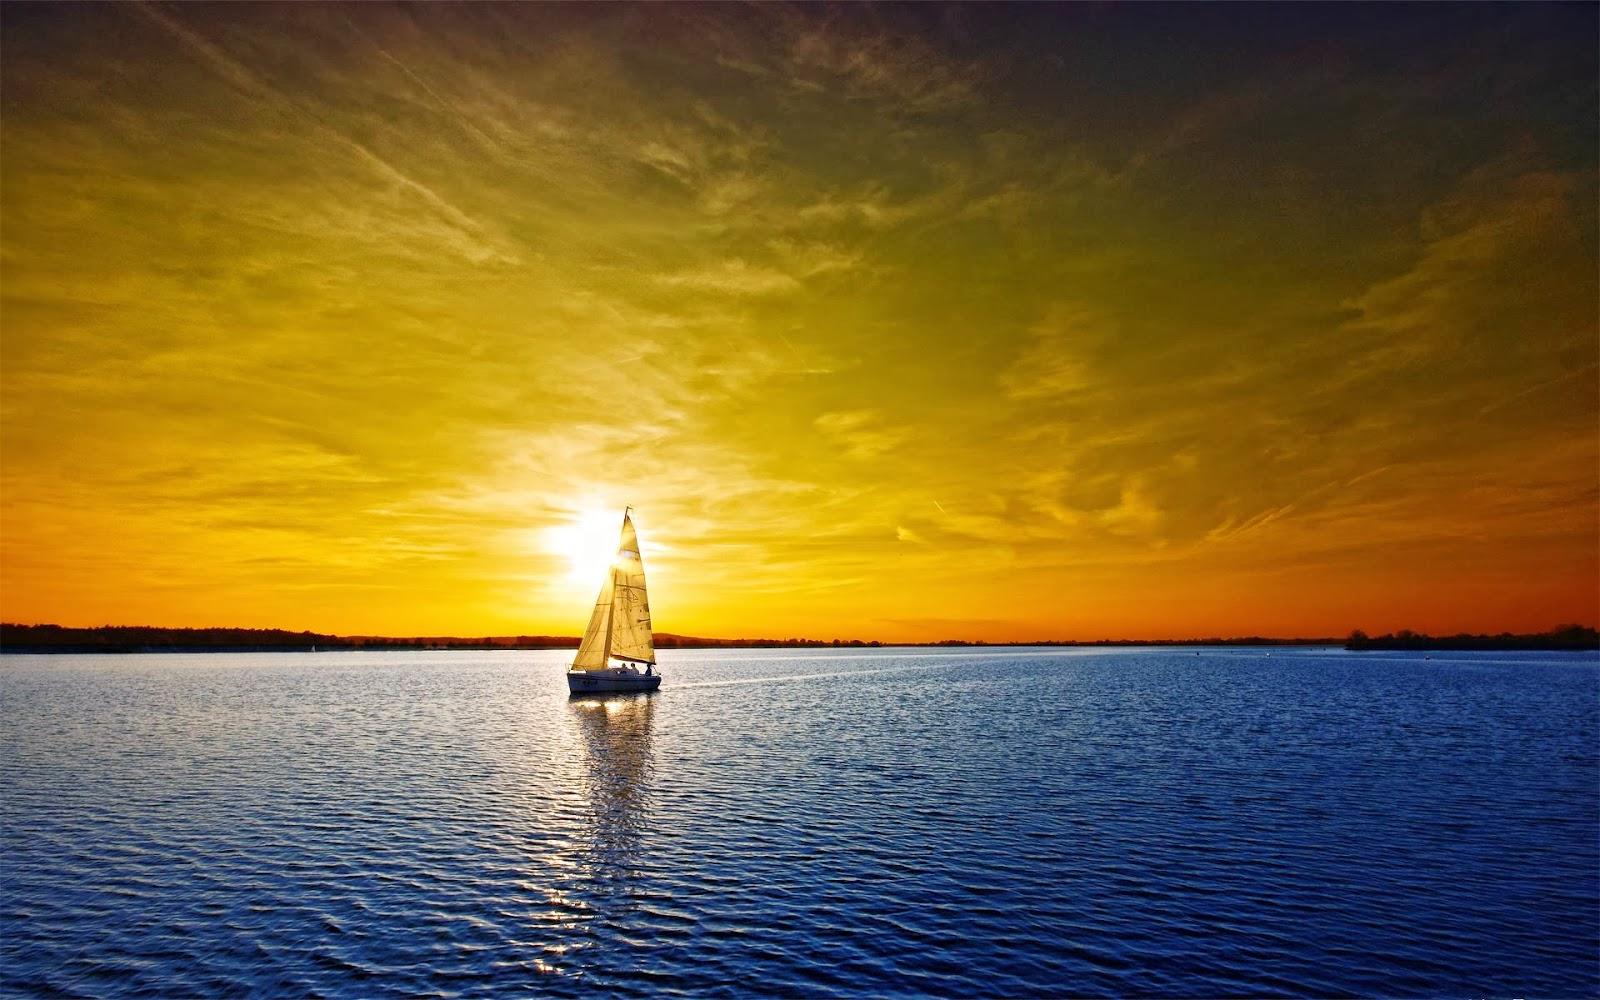 "<img src=""http://4.bp.blogspot.com/-yyBc8oOKo9c/Ut7WKbz6gNI/AAAAAAAAJro/uY8Q0_qtvBg/s1600/amazing-sunset.jpg"" alt=""amazing sunset"" />"